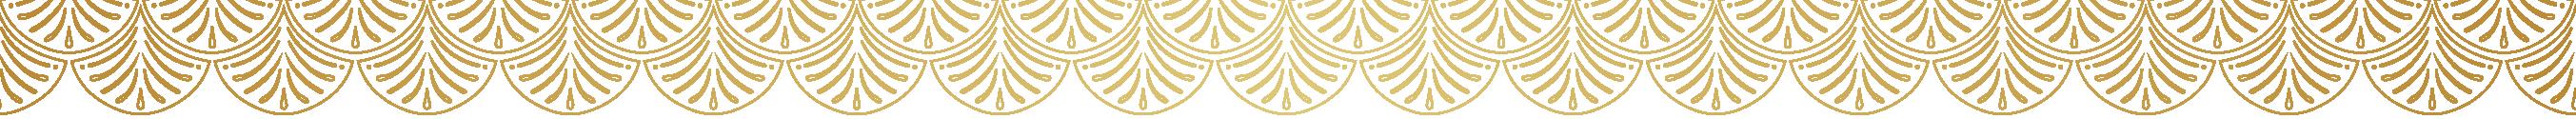 LandingPage_Scallop002_SmScale_Gold_Flip